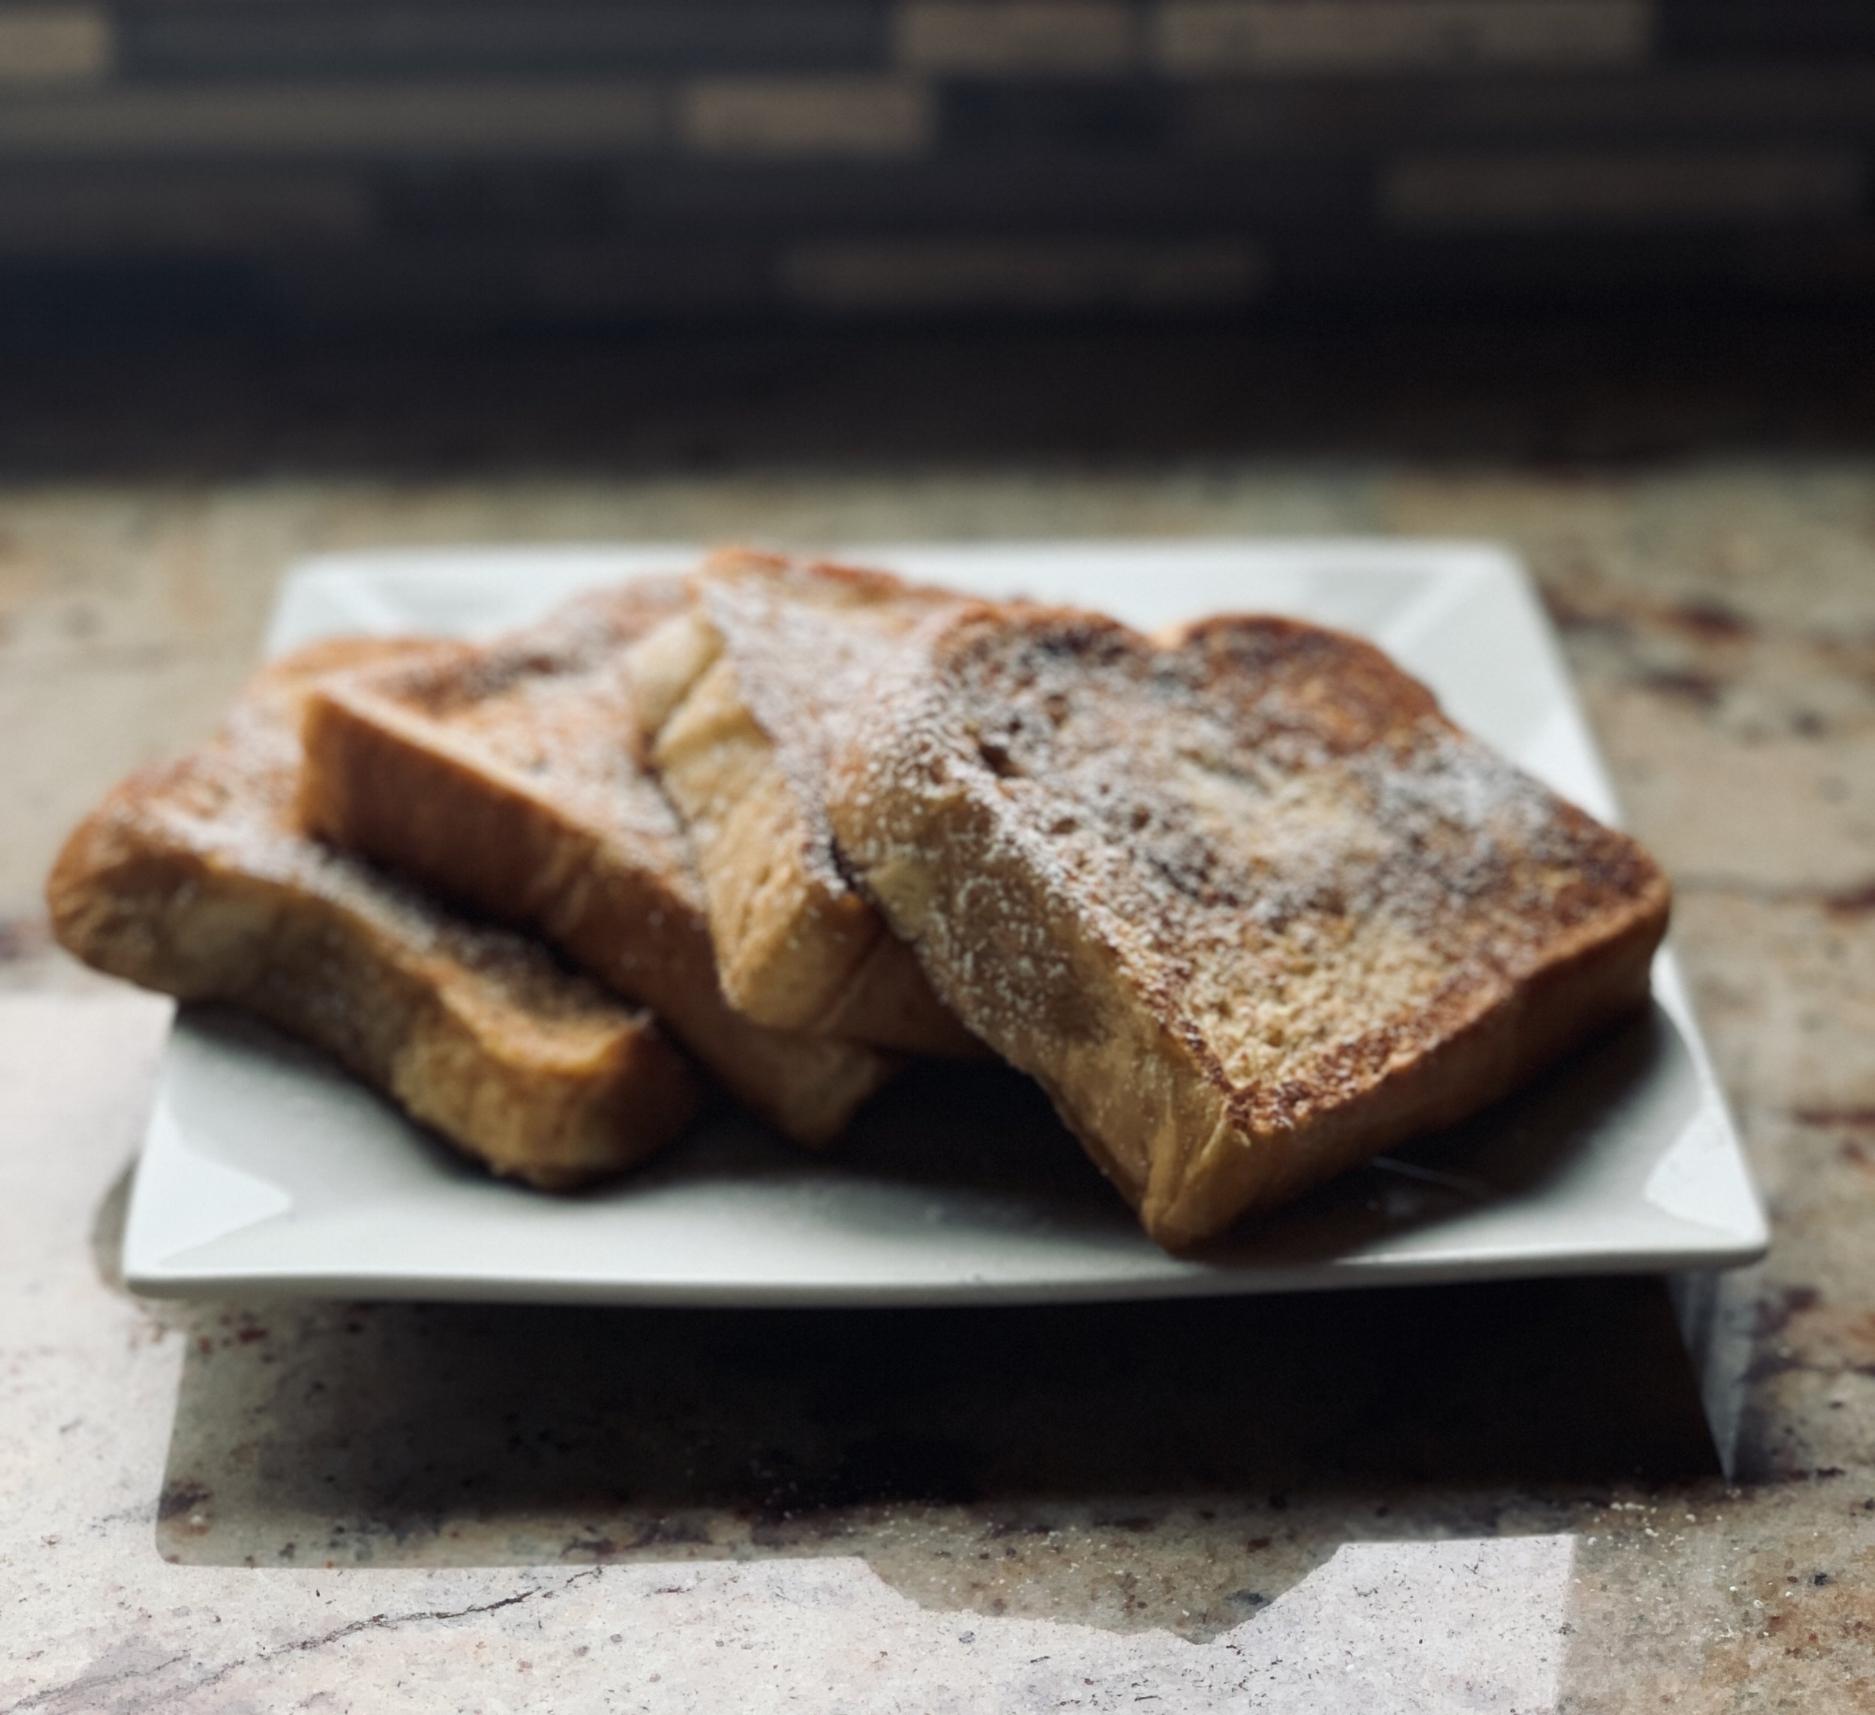 French Toast with brioche bread